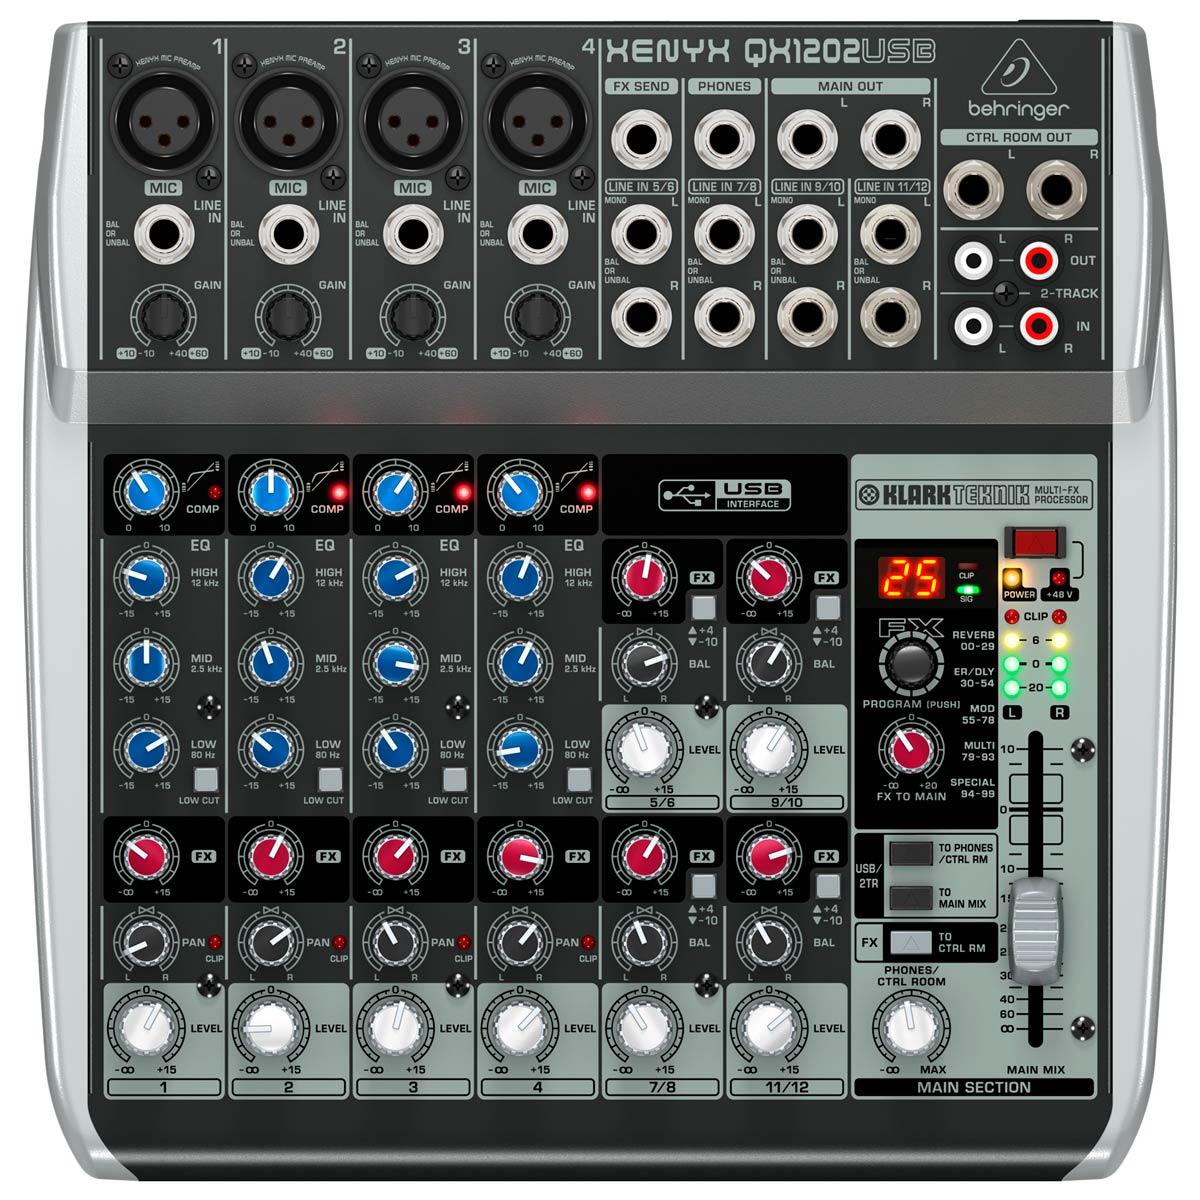 Mesa de Som 12 Canais Balanceados (4 XLR + 8 P10) c/ USB / Efeito / Phantom / 1 Auxiliar Xenyx QX 1202 USB - Behringer